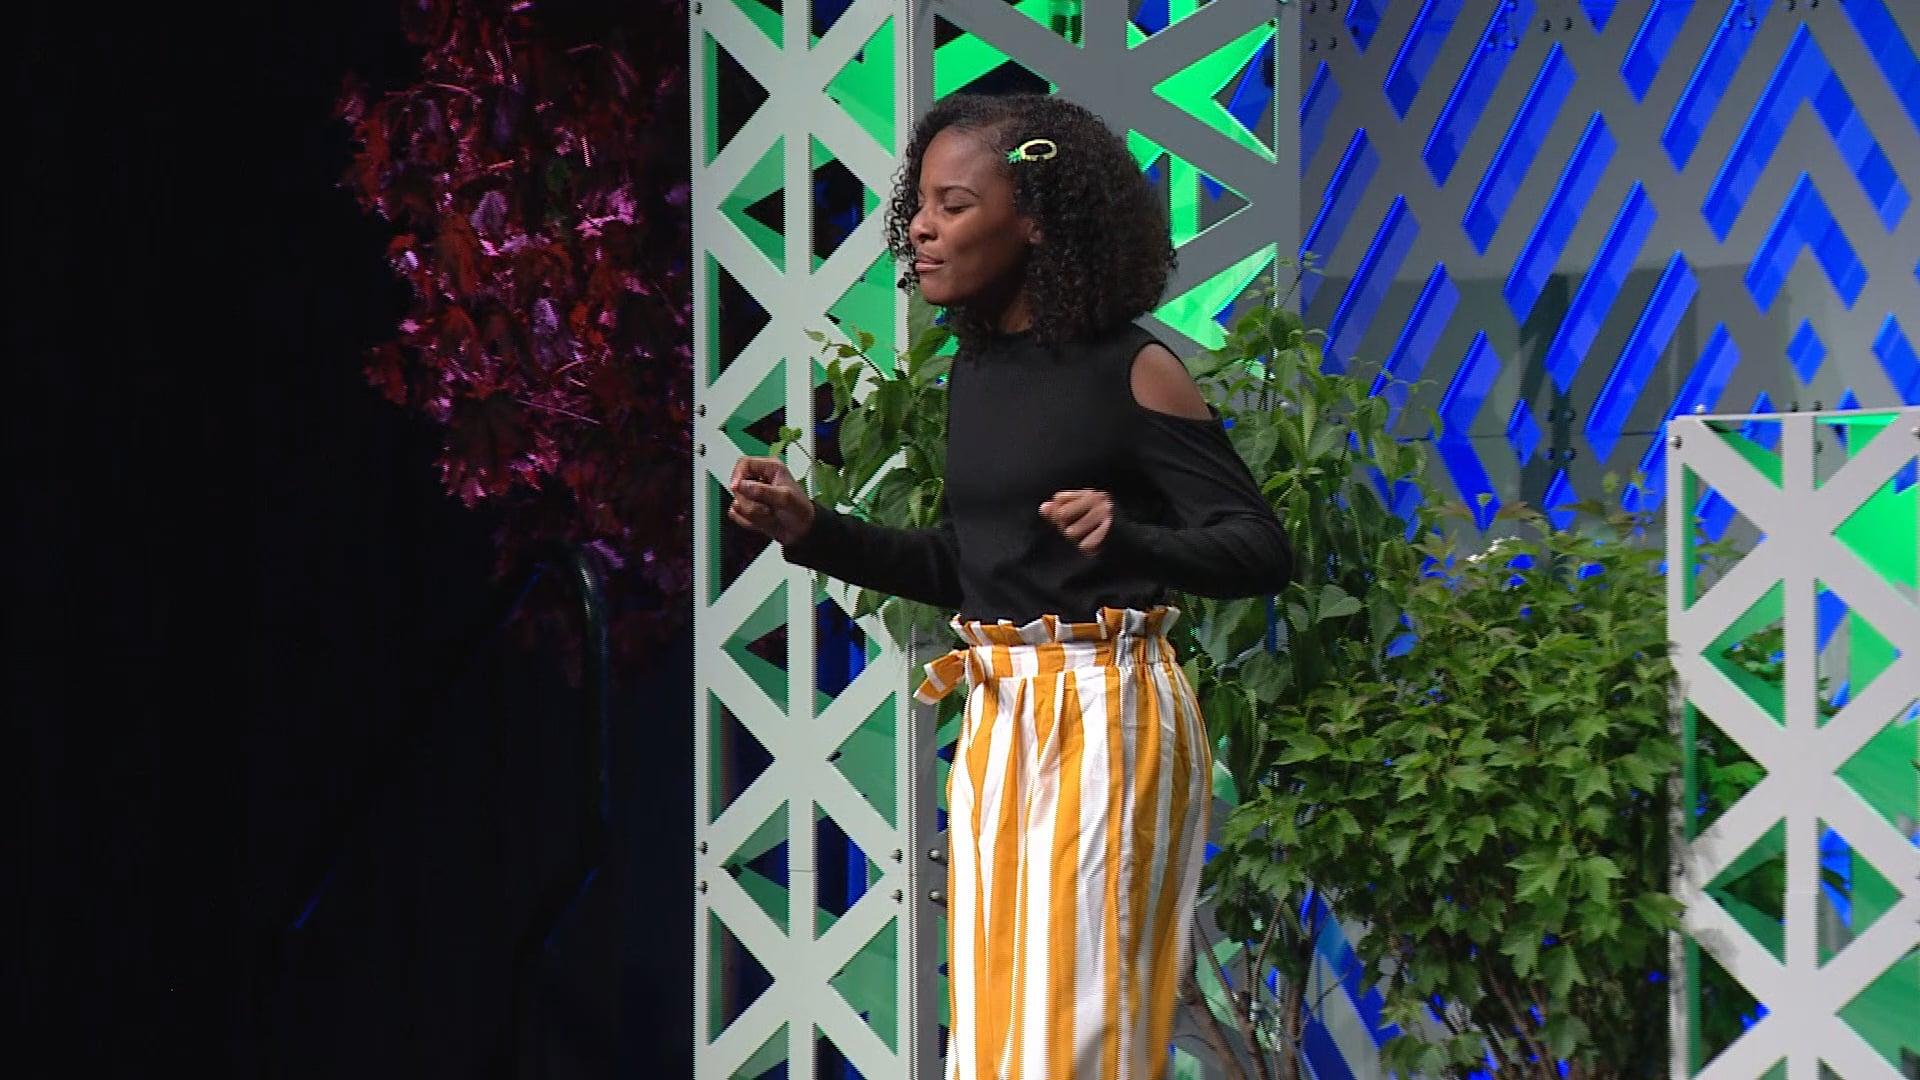 SB'19 Detroit Keynote / Mari Copeny (Little Miss Flint) - Activist & Philanthropist